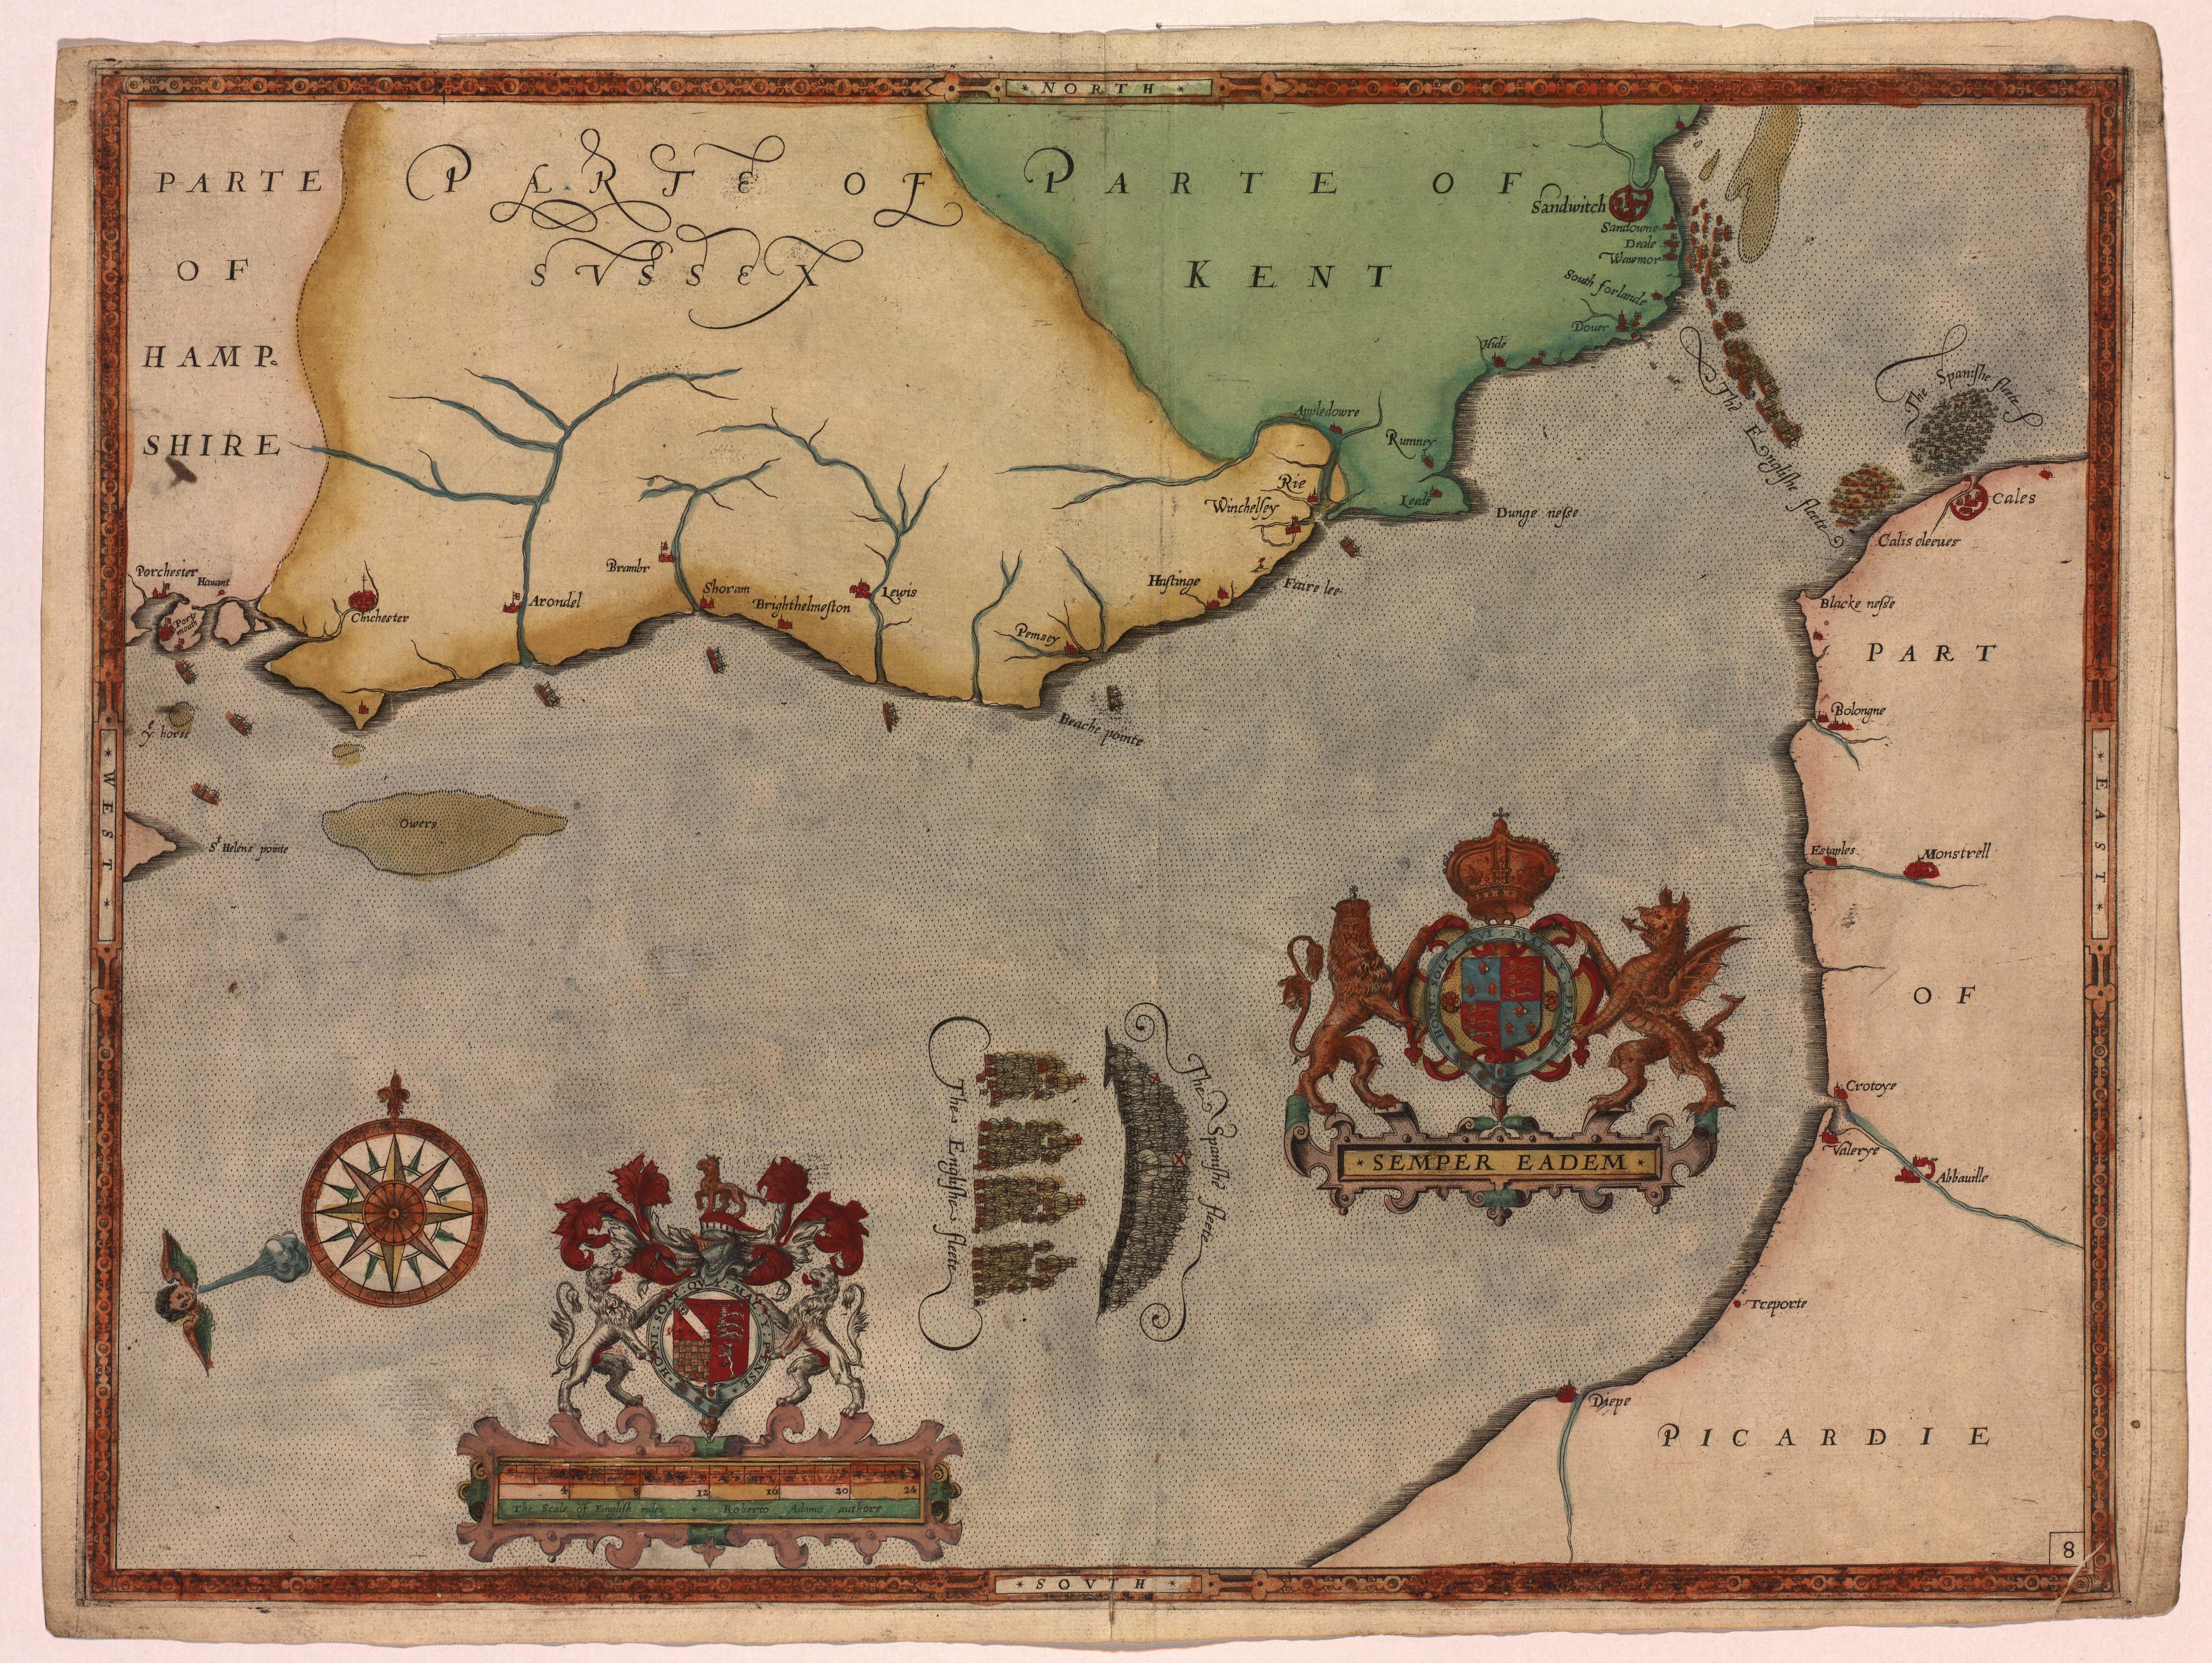 Expeditionis Hispanorum in Angliam, 1588, by Robert Adams (London, 1590). (LOC)